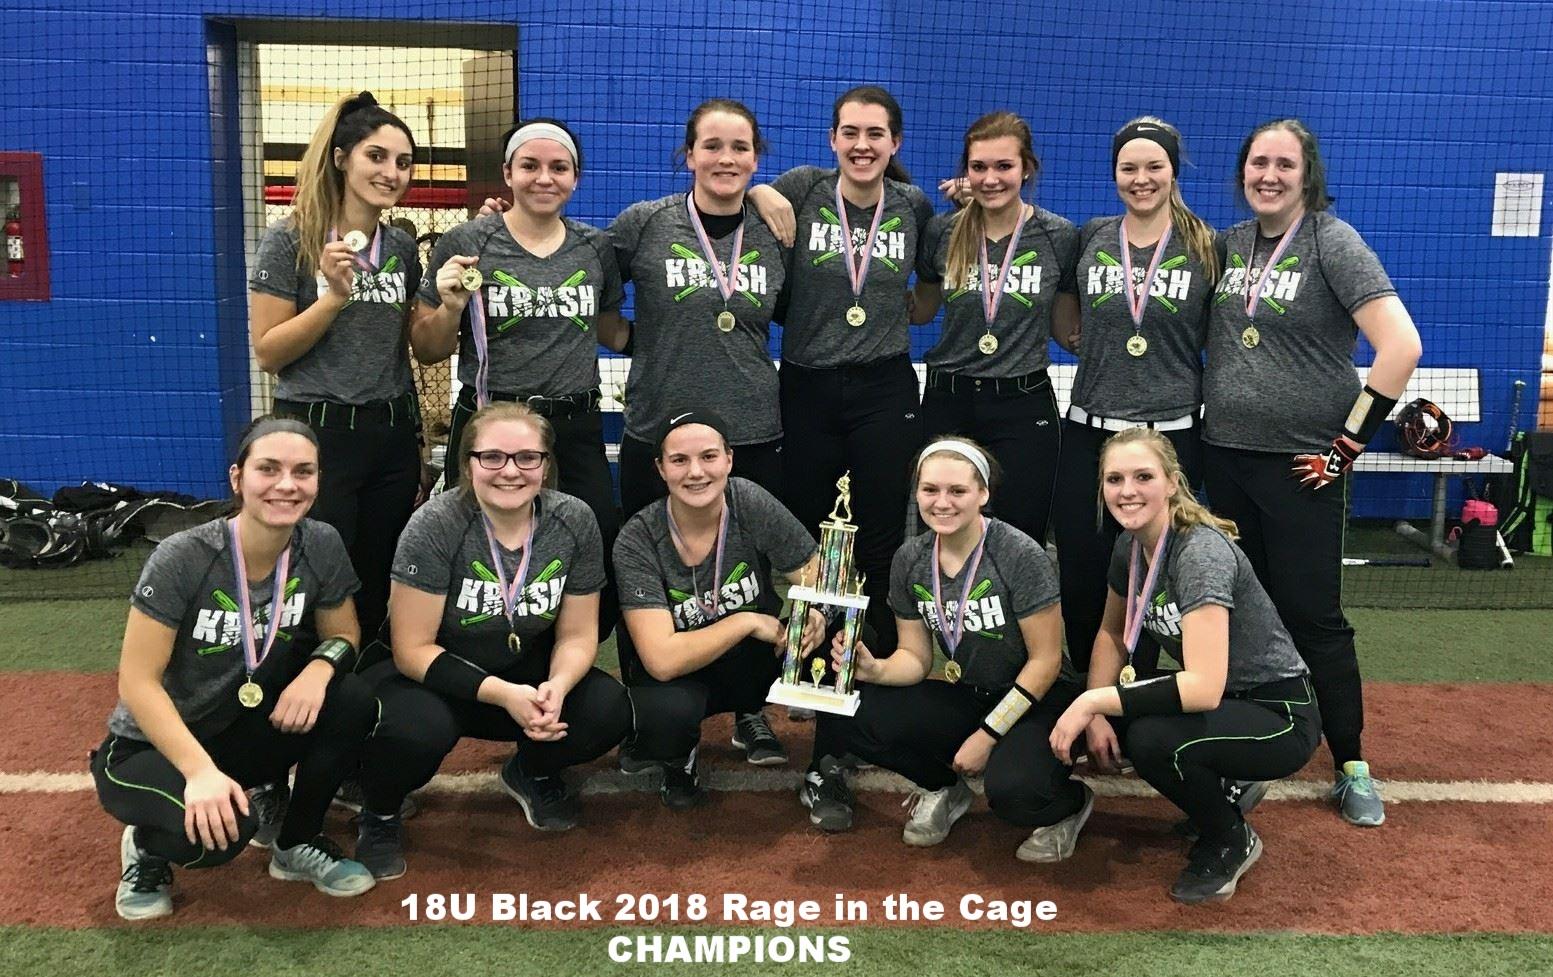 18U Black - Rage in the Cage.jpg